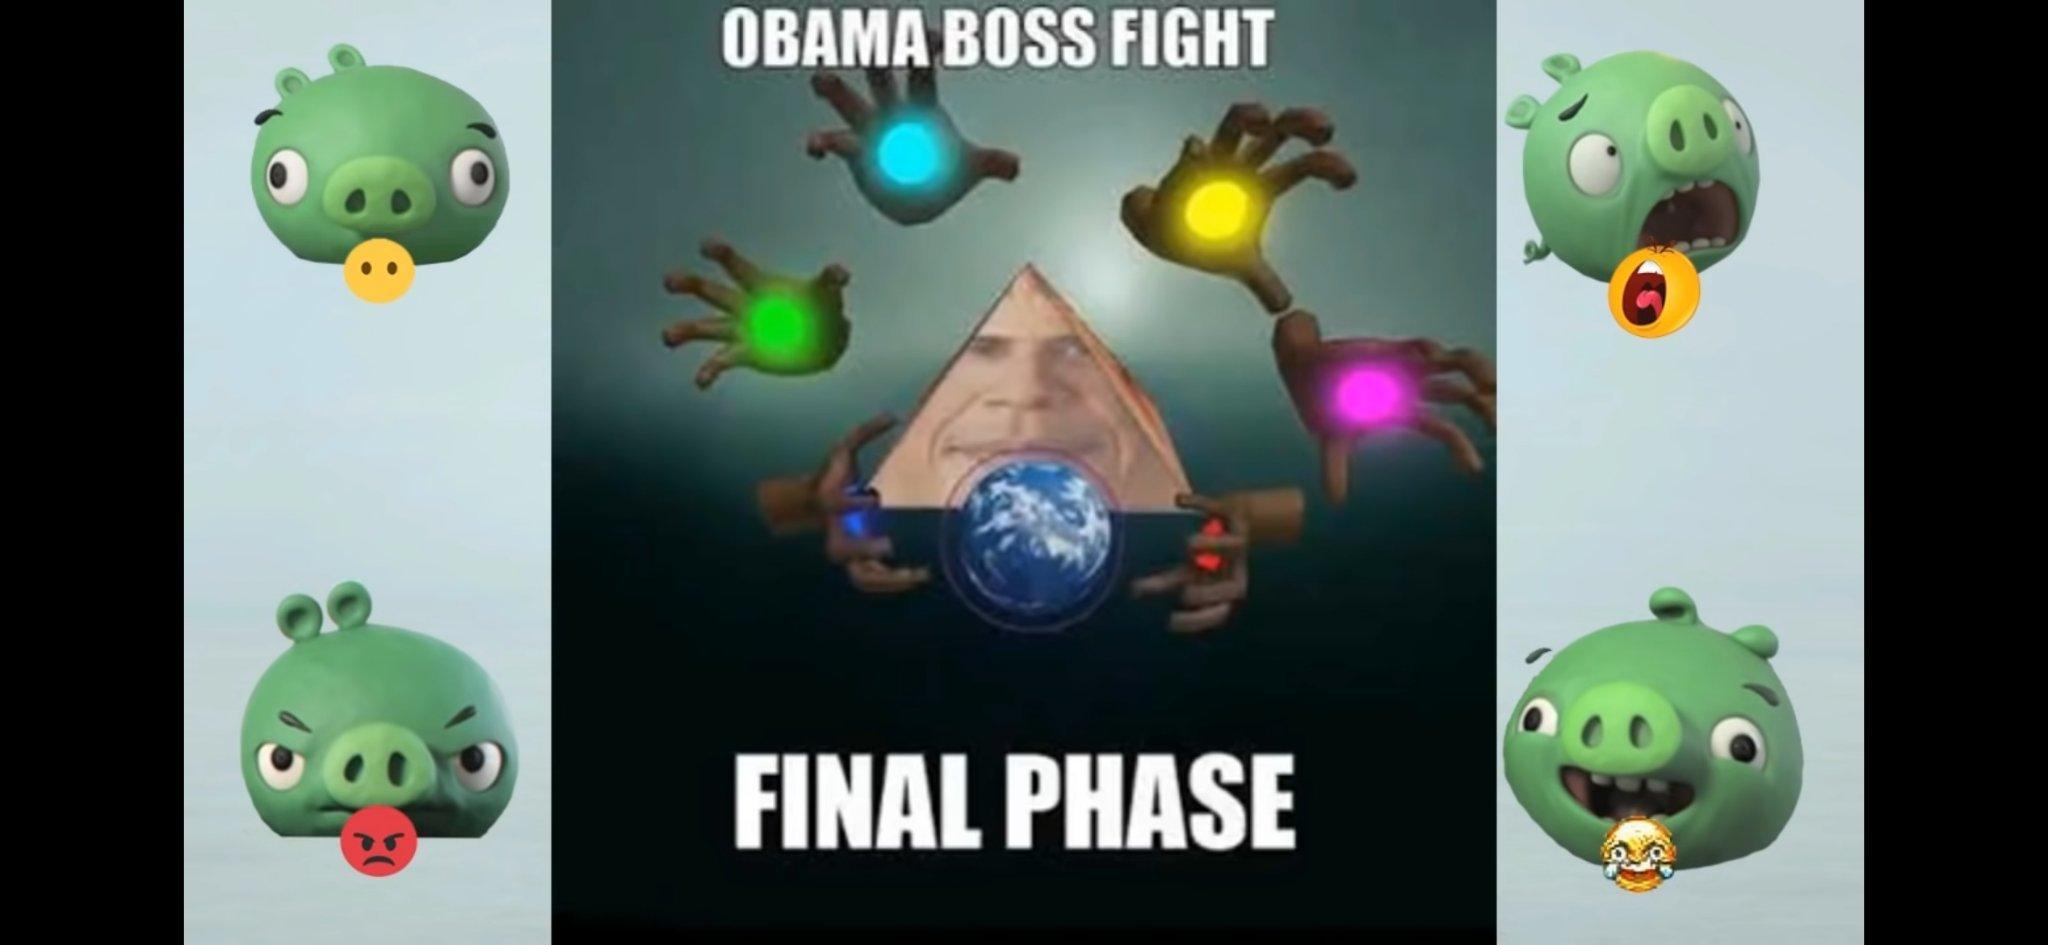 Obama boss final phase - meme